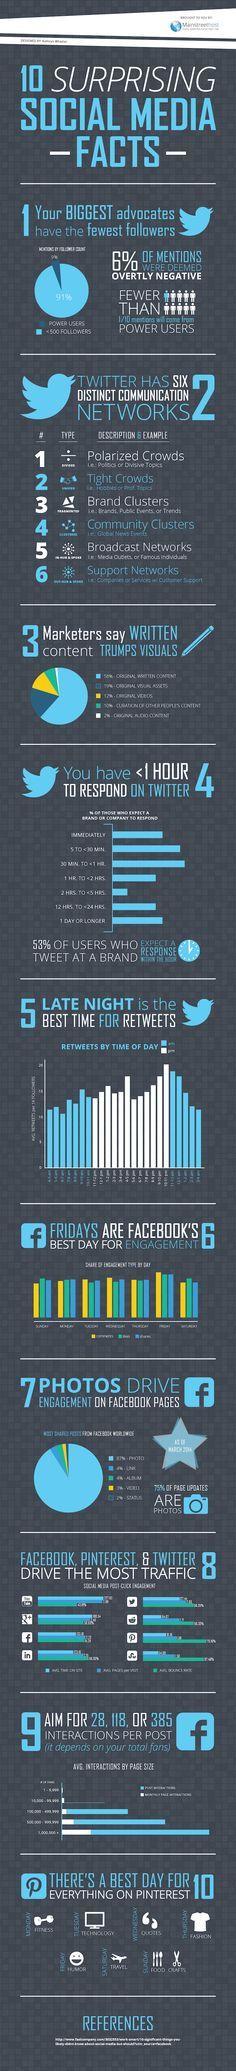 10 Surprising Social Media Facts #Infographic | via #BornToBeSocial - Pinterest Marketing